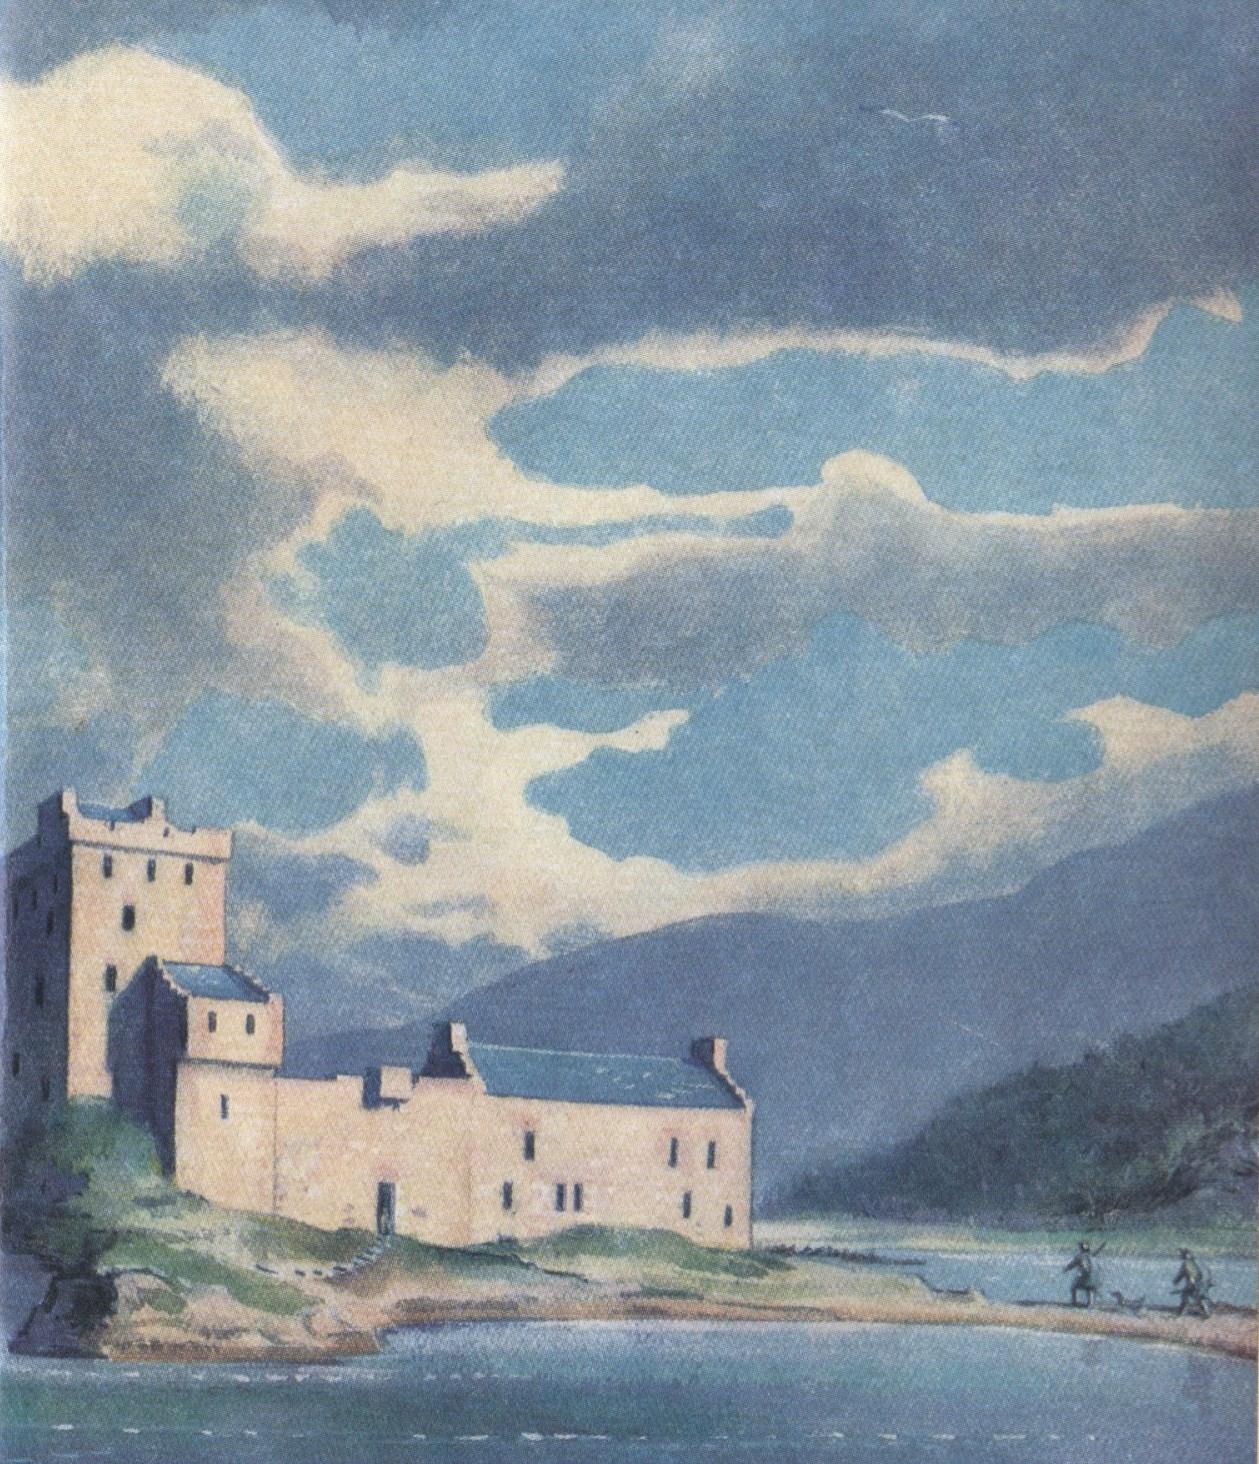 The Castle on Eilean Greig